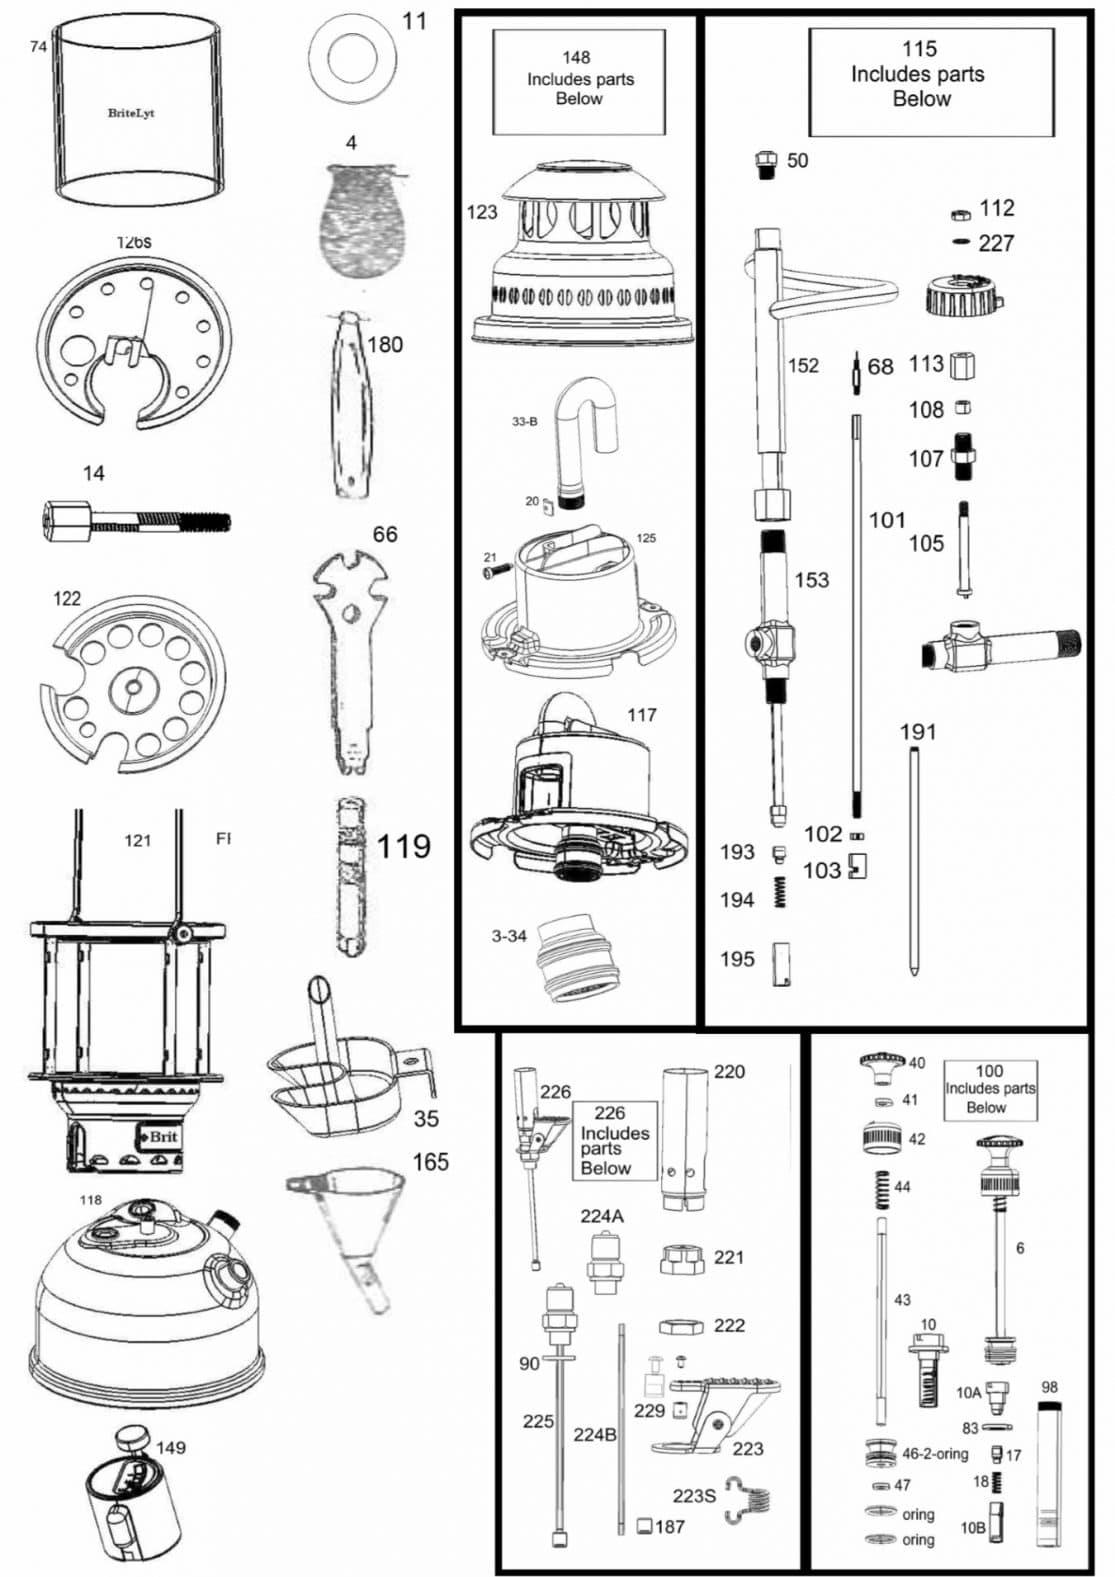 parts breakdown page